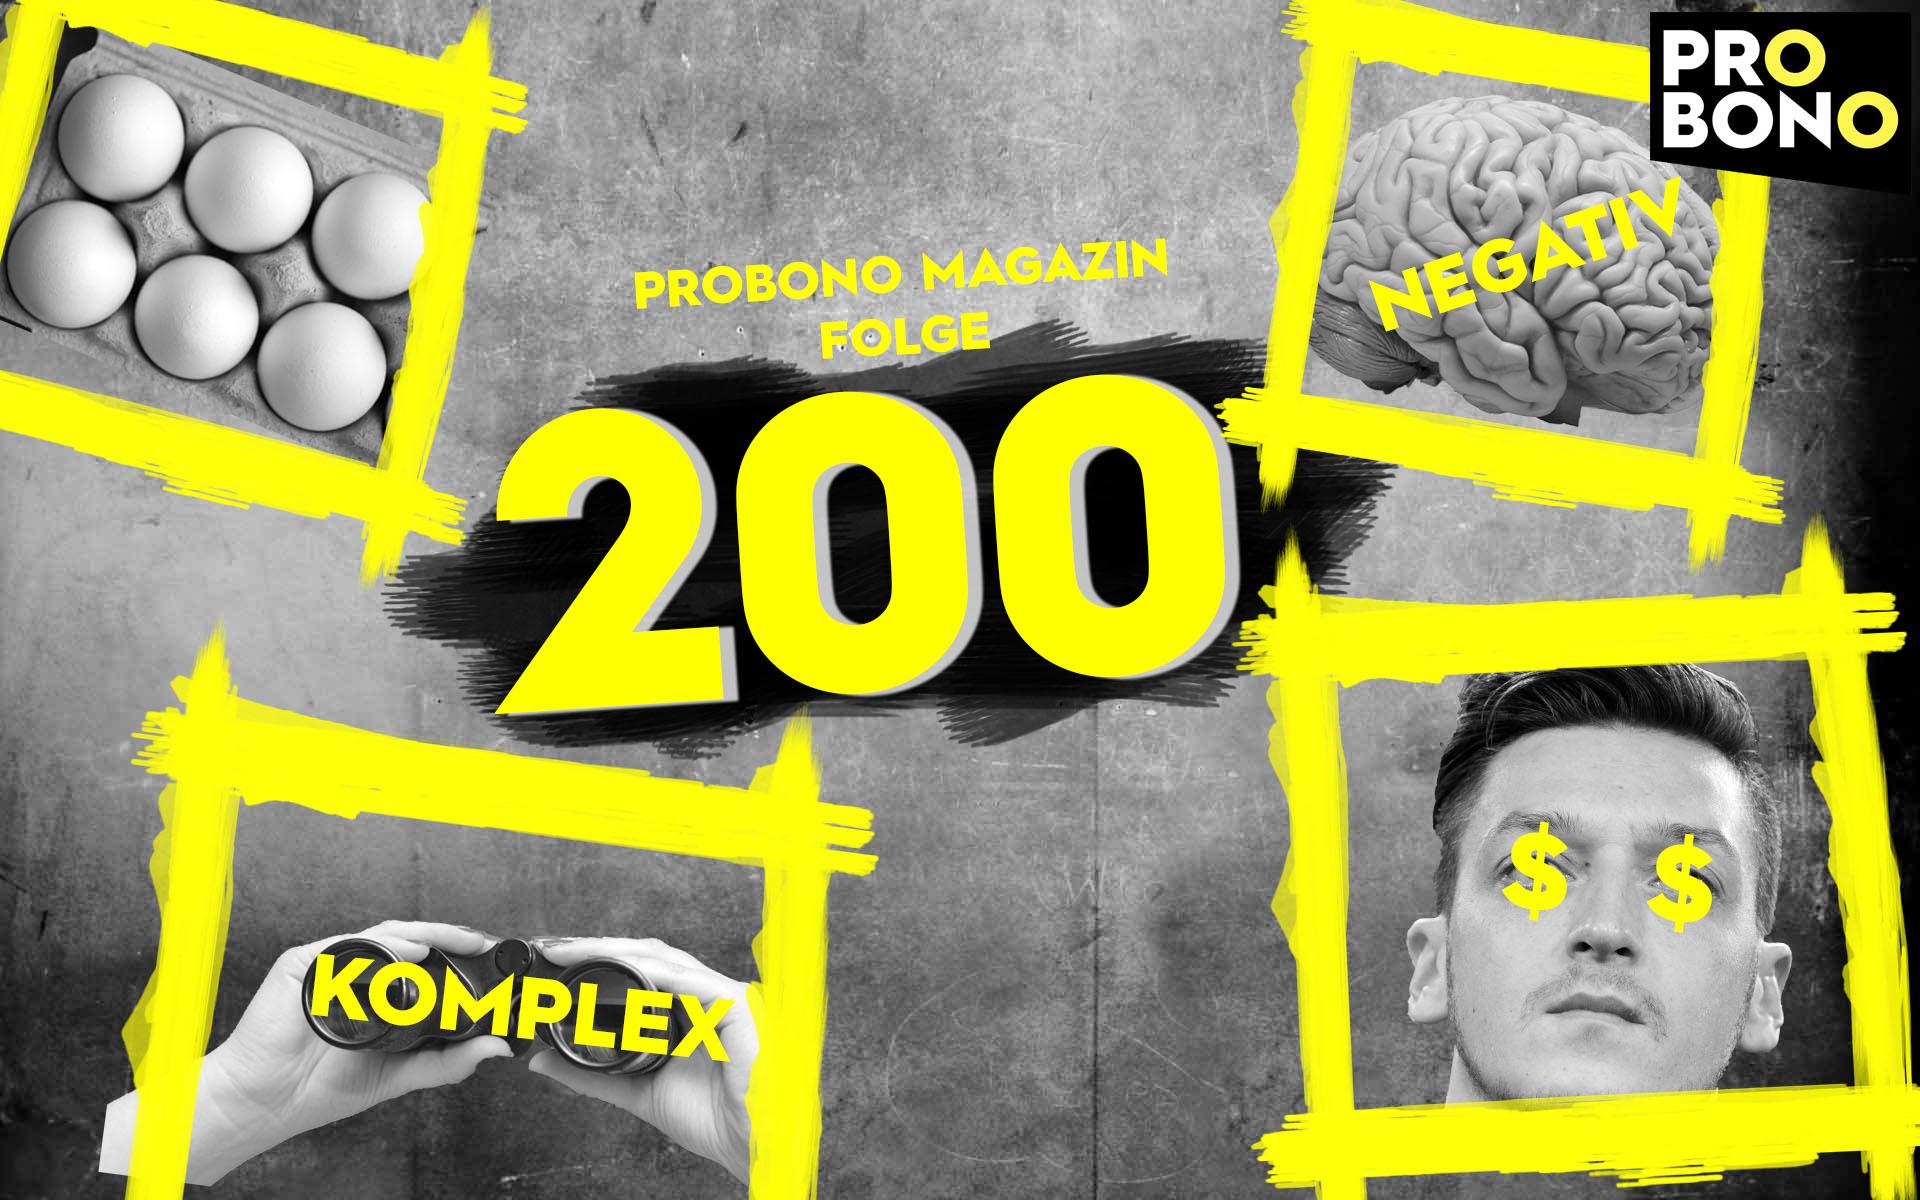 Özil & #MeTwo: Was tun gegen Rassismus im Alltag (probono Magazin)